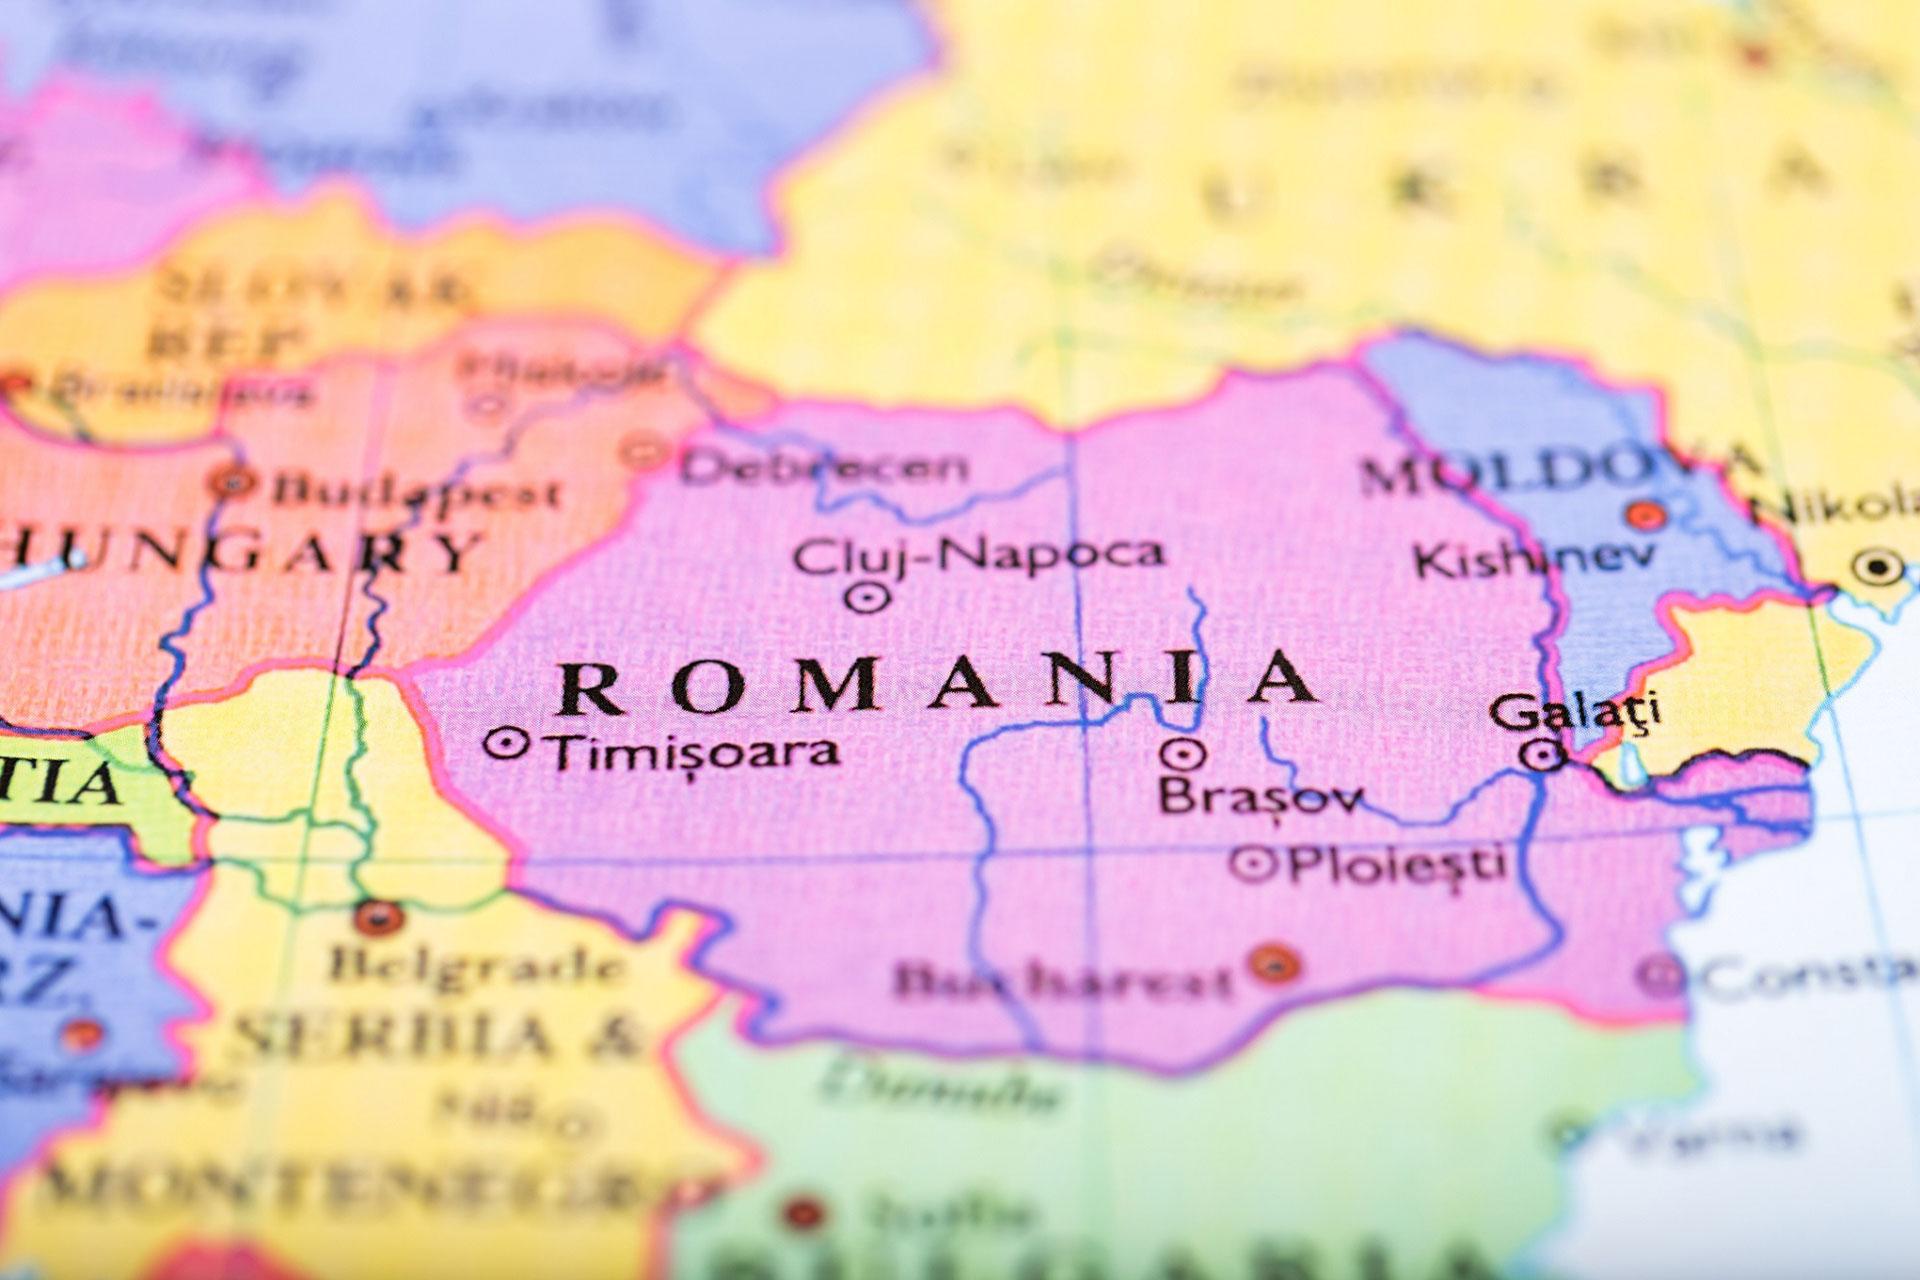 Romania map 001 1920x1280 v3